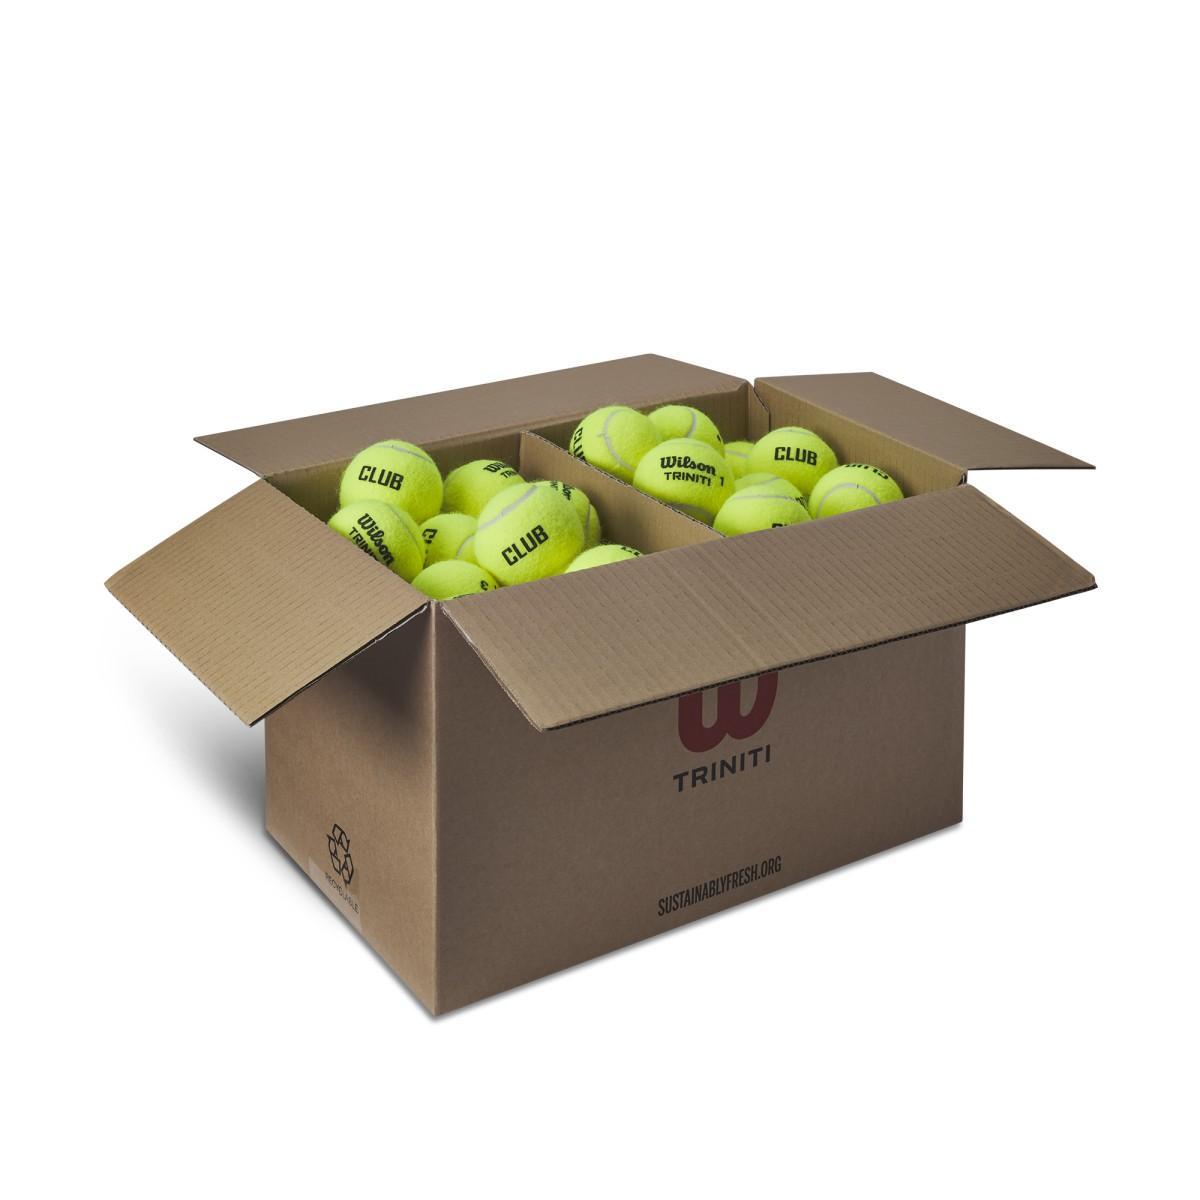 Wilson Triniti Club Tennis Ball Case of 72 $53.33 (min 2 case) free shipping